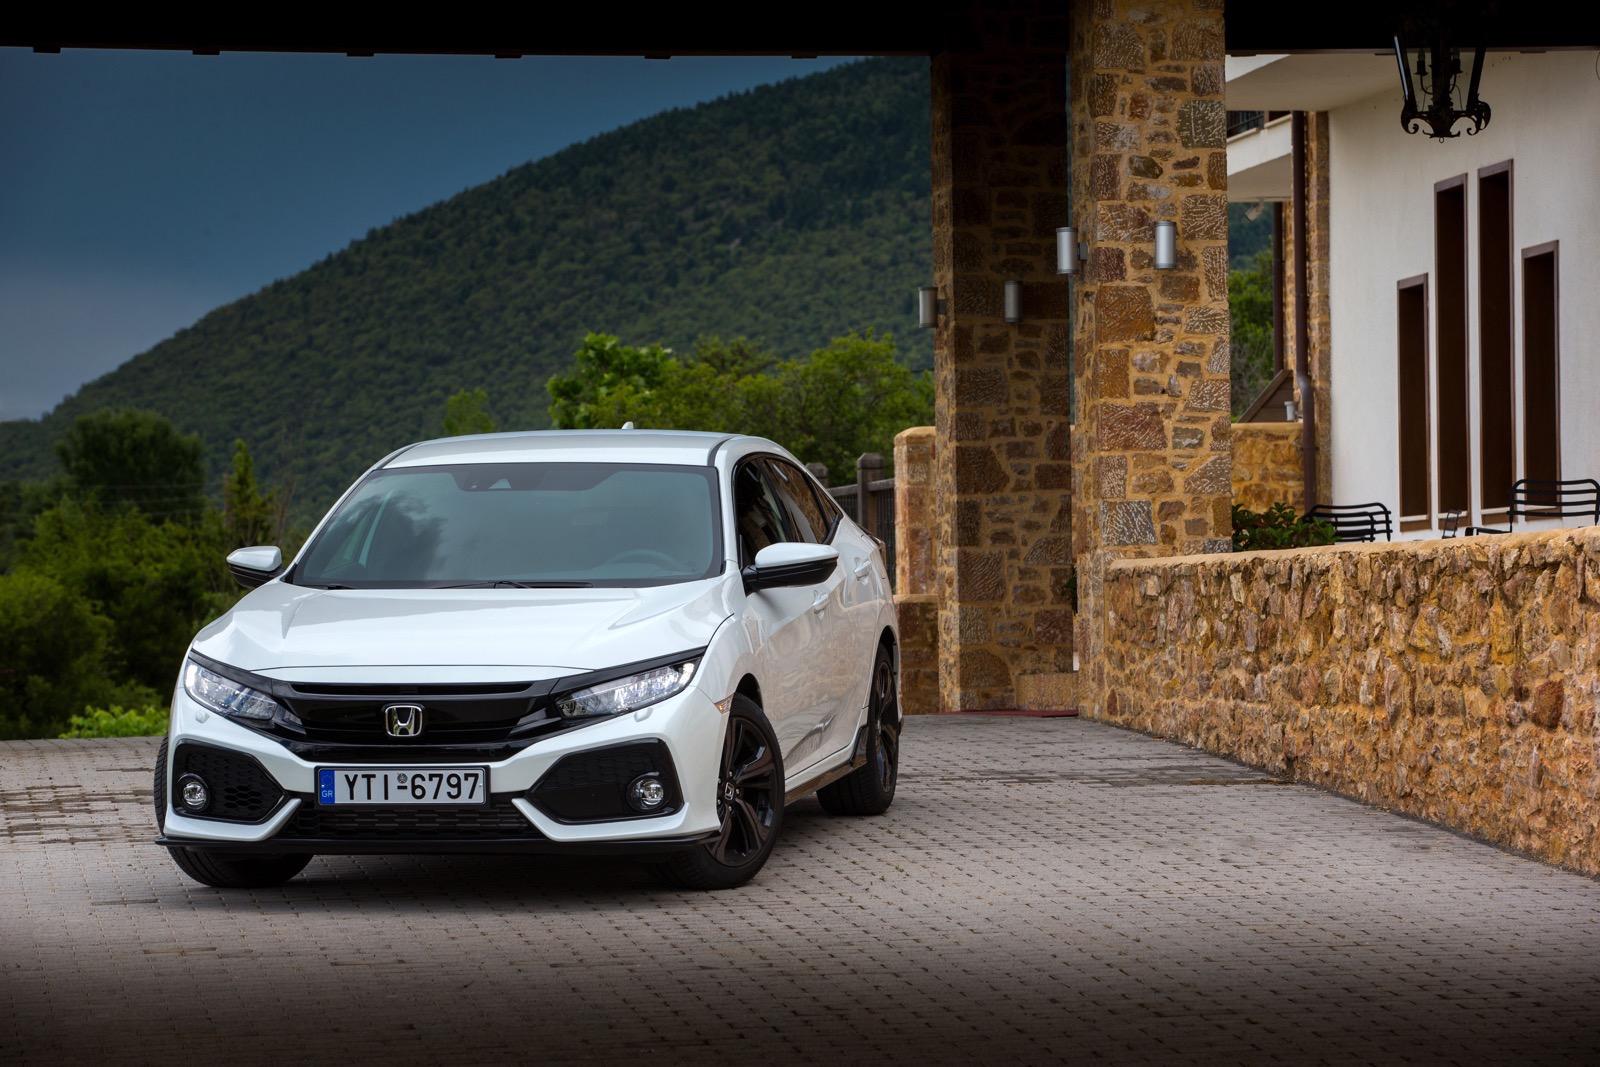 New_Honda_Civic_First_Drive_62